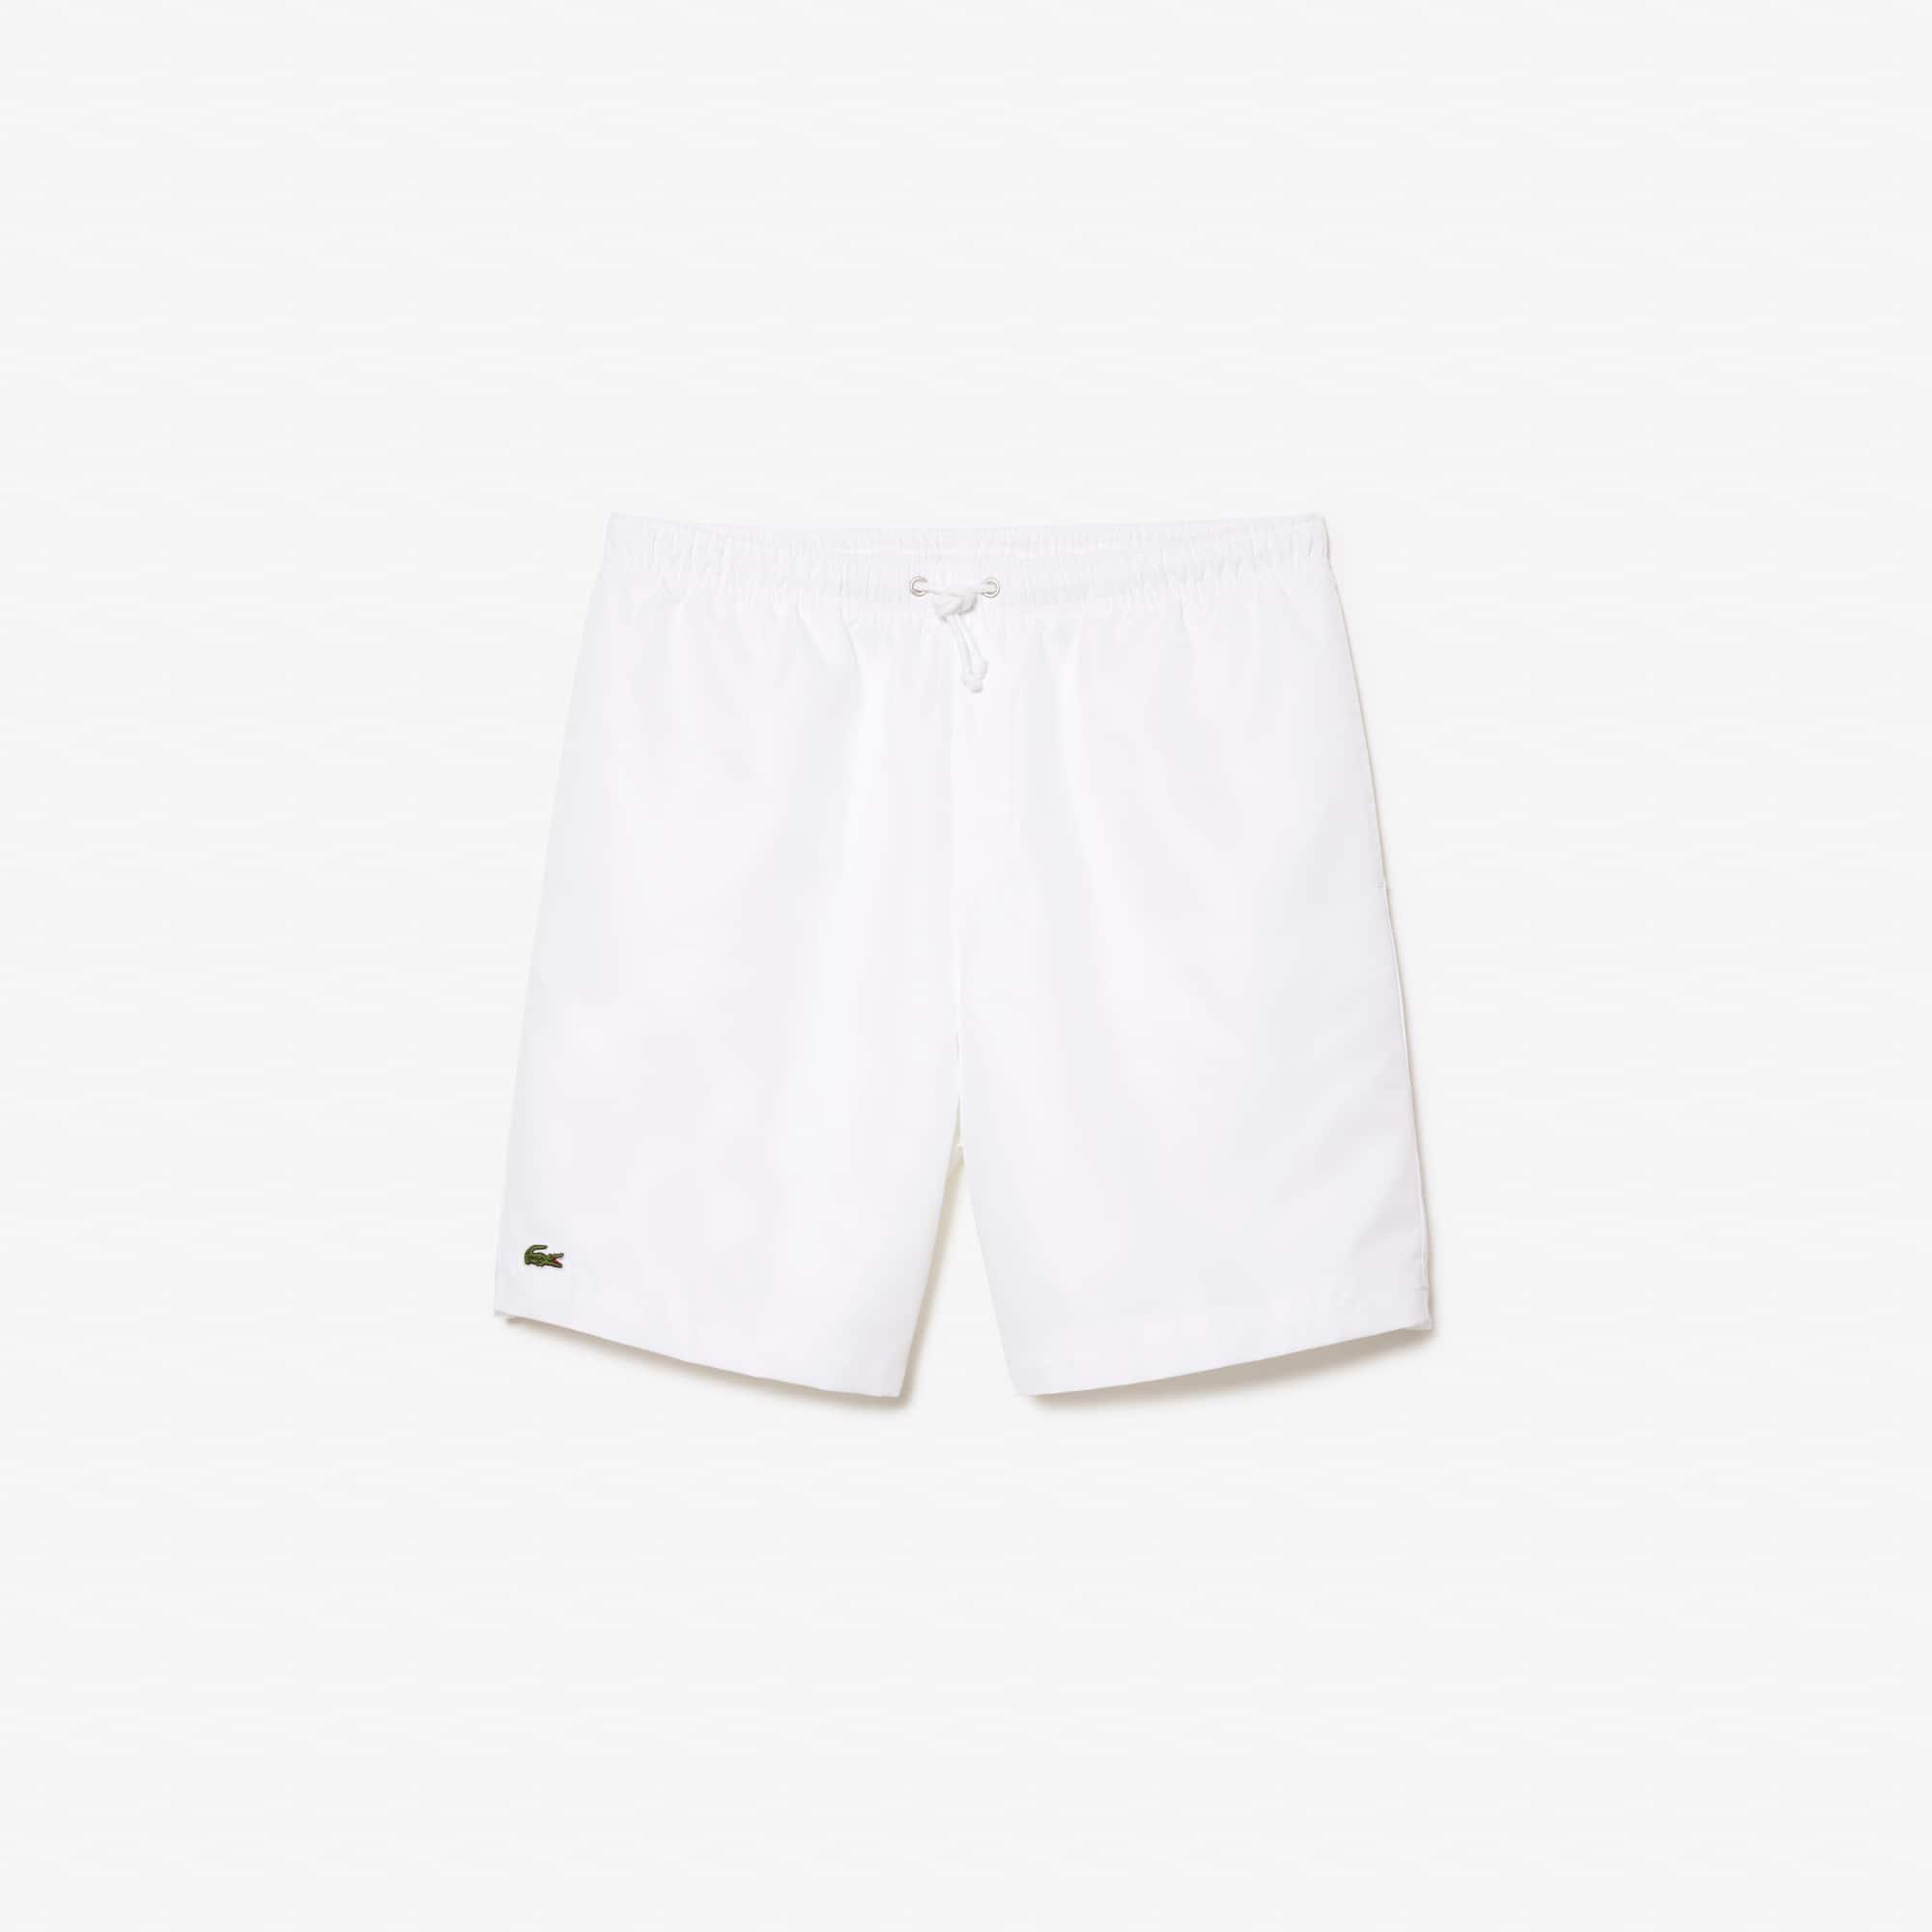 Tennis-Shorts aus rautenförmig gewebtem Taft LACOSTESPORT Tennis